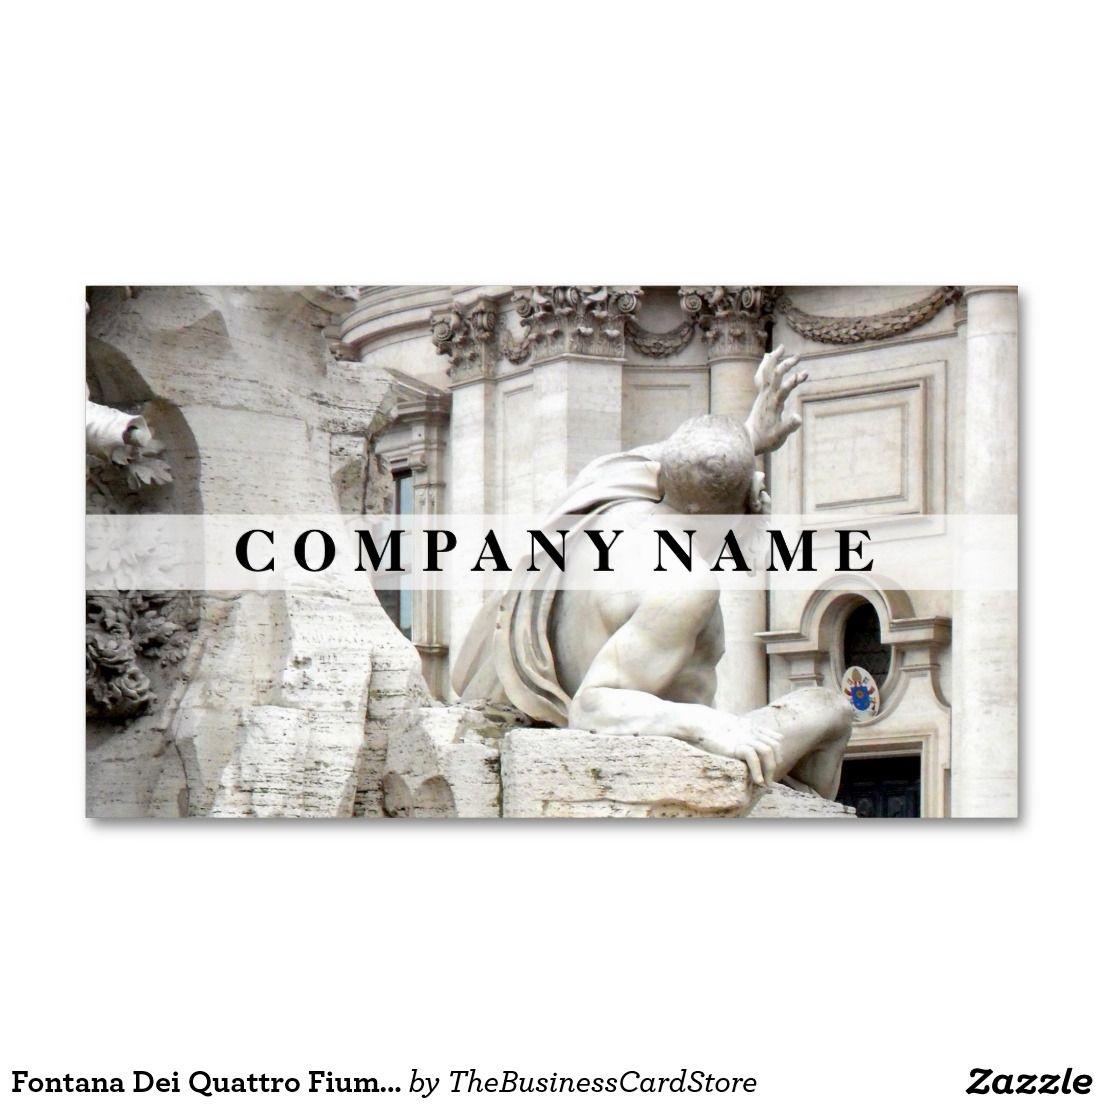 Fontana dei quattro fiumi fountain roma italy business card fontana dei quattro fiumi fountain roma italy business card reheart Images